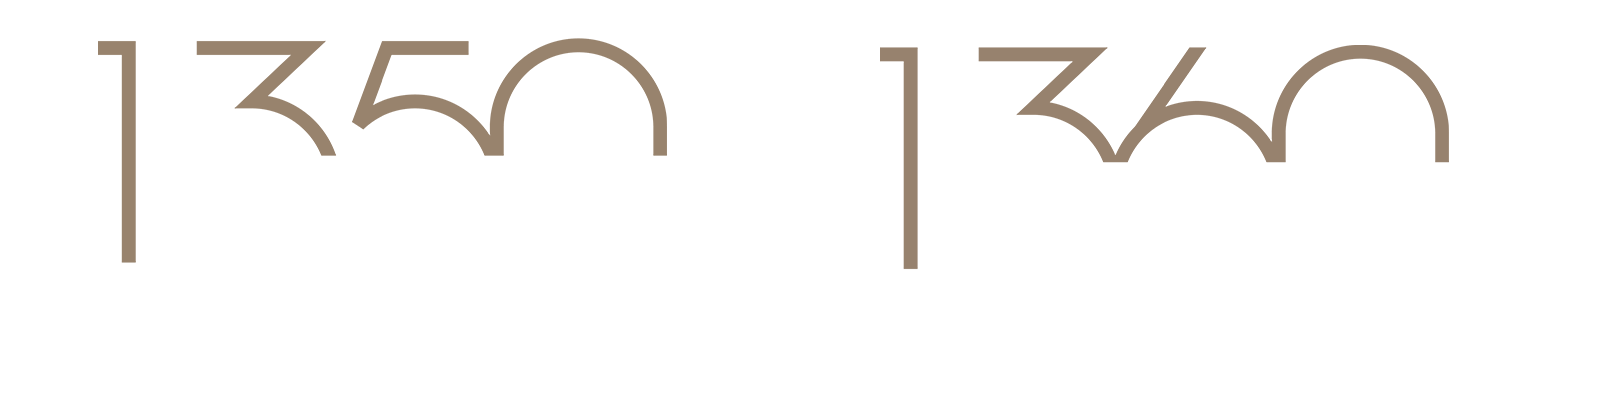 The 1350-1360 Lake Shore Drive logo.